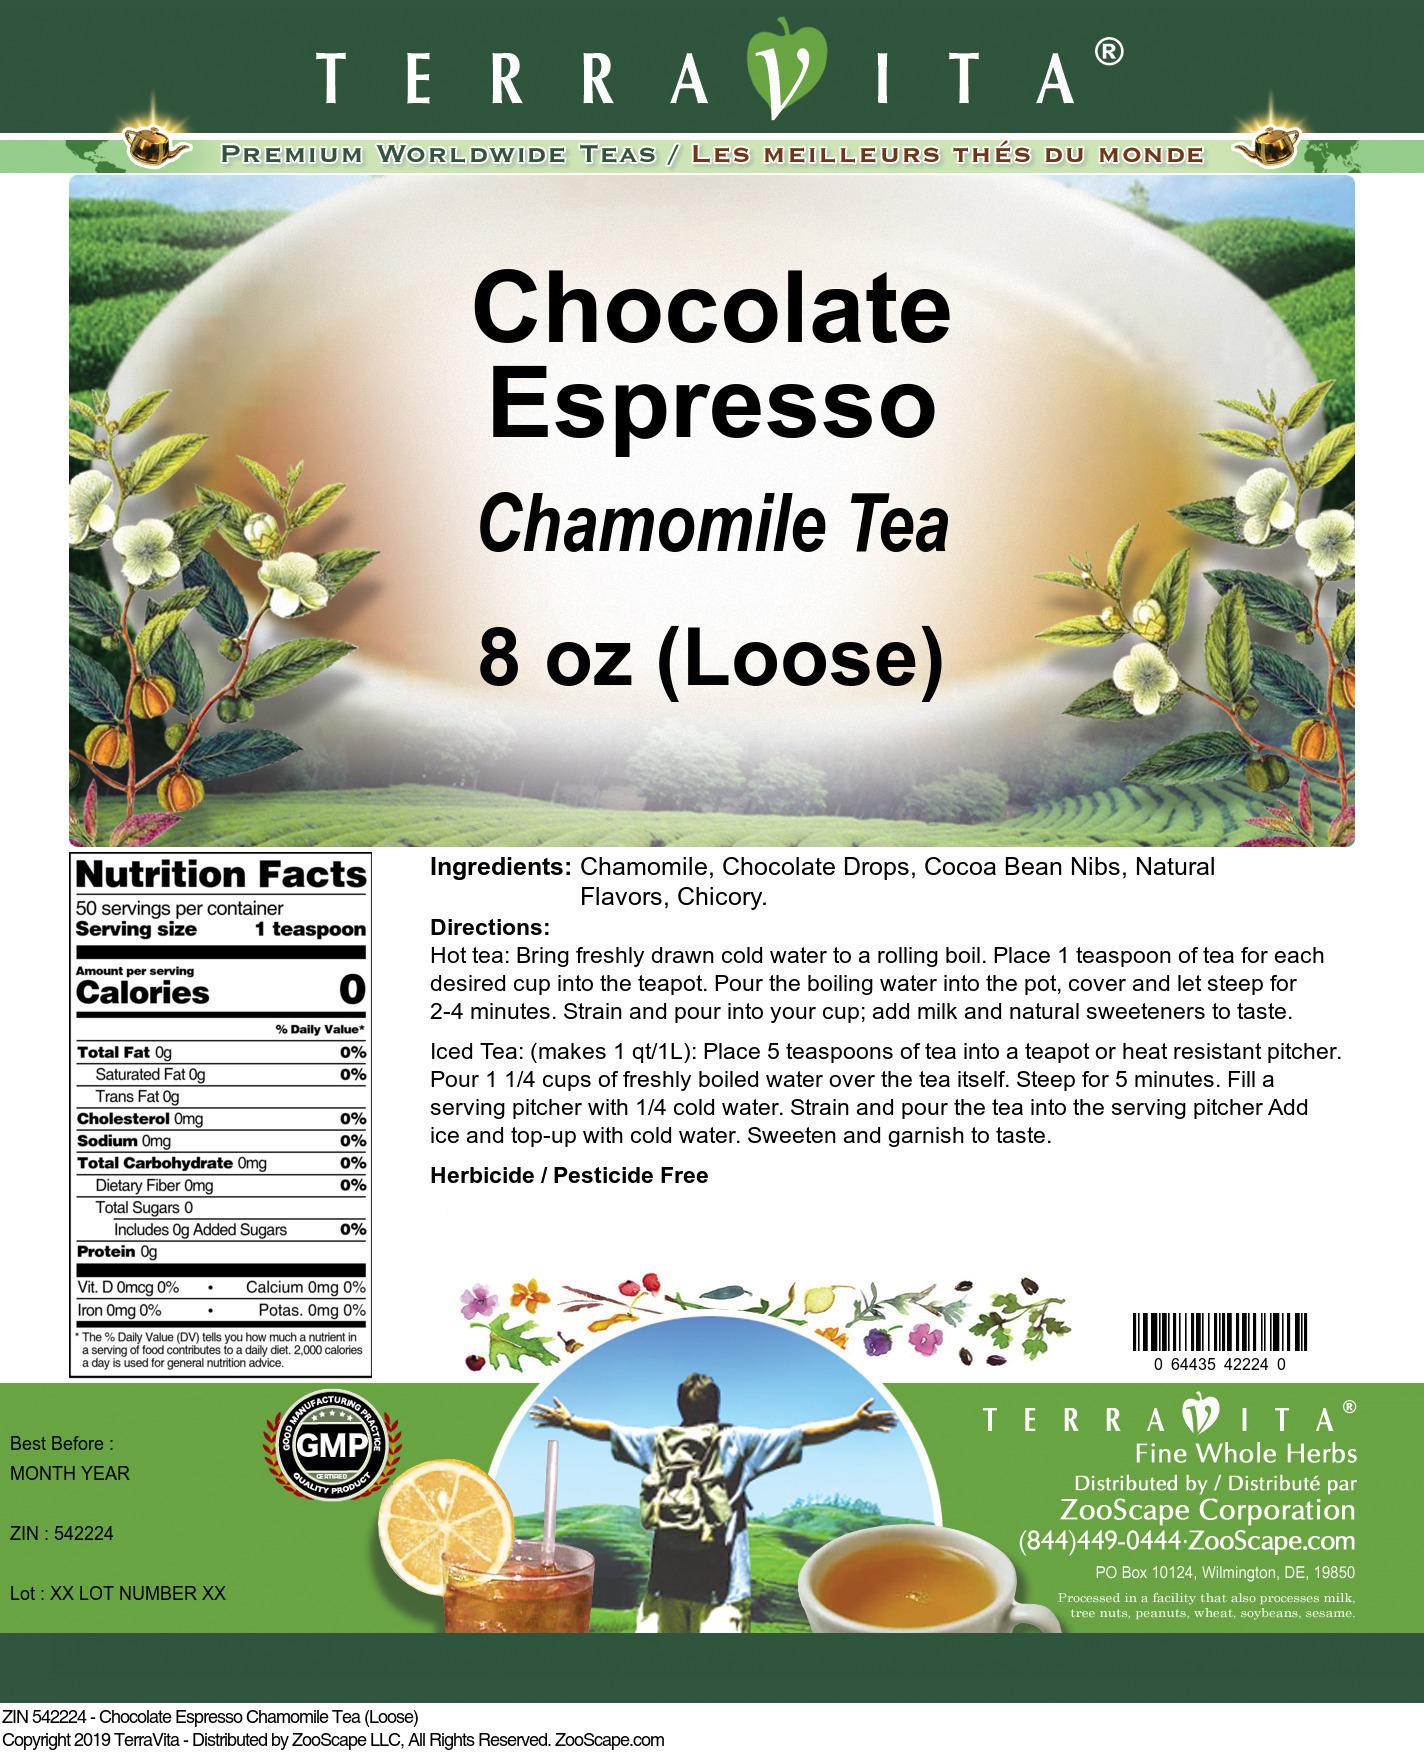 Chocolate Espresso Chamomile Tea